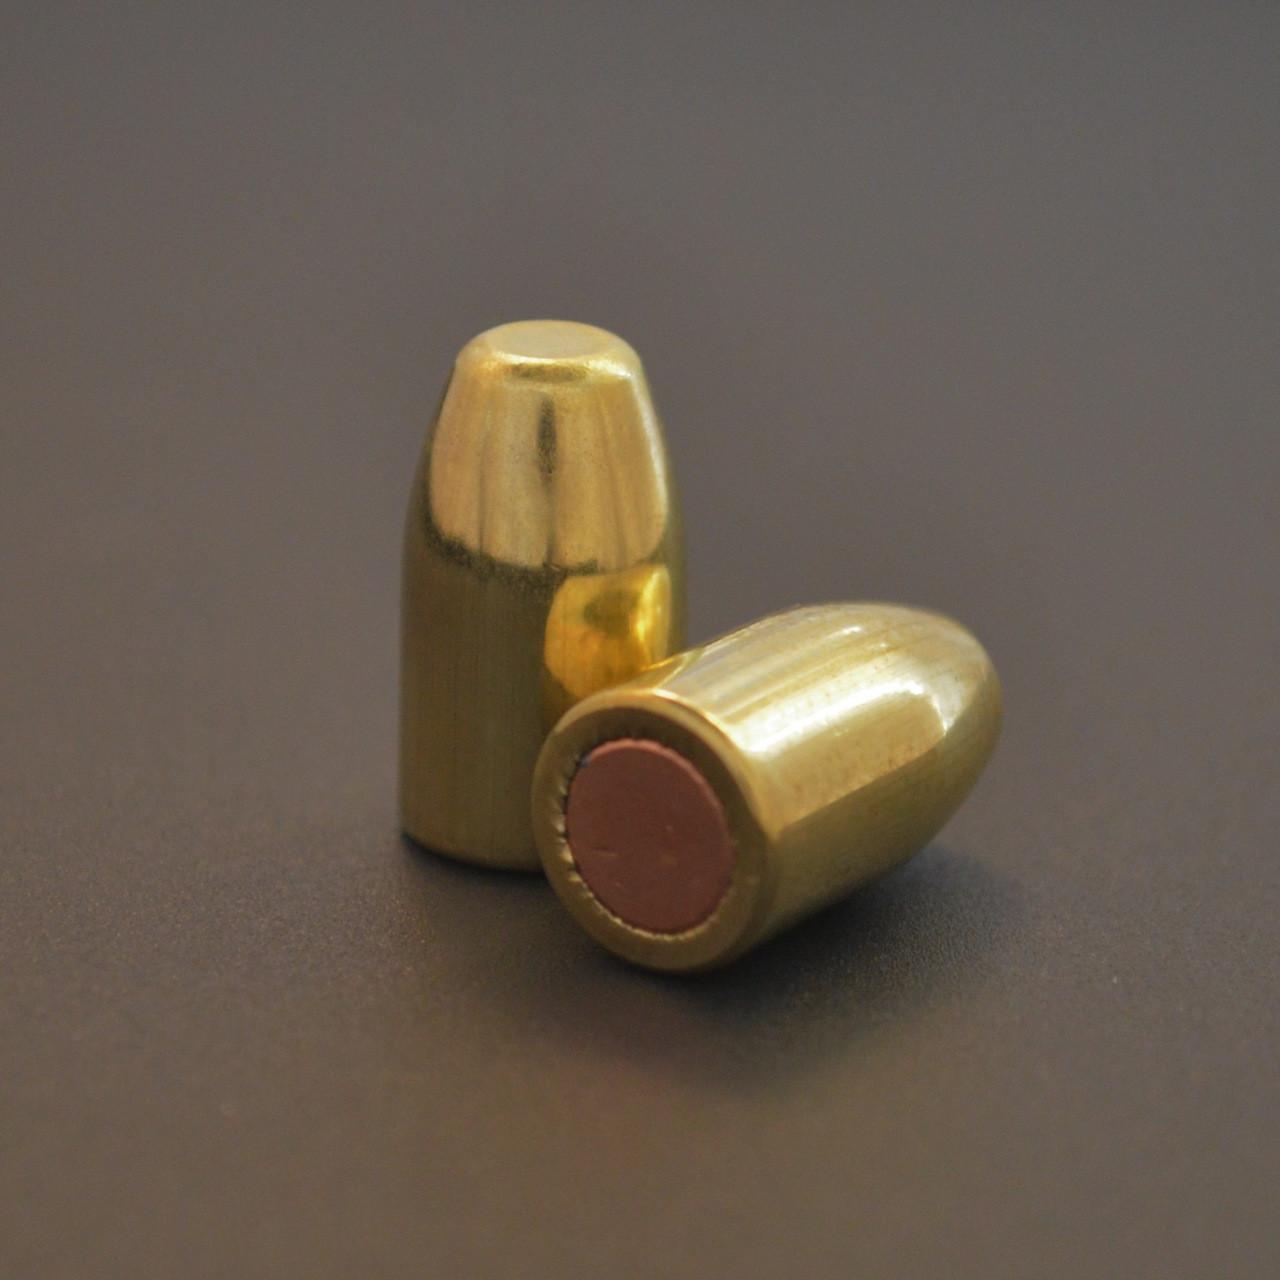 9mm/147gr CMJ - 100ct